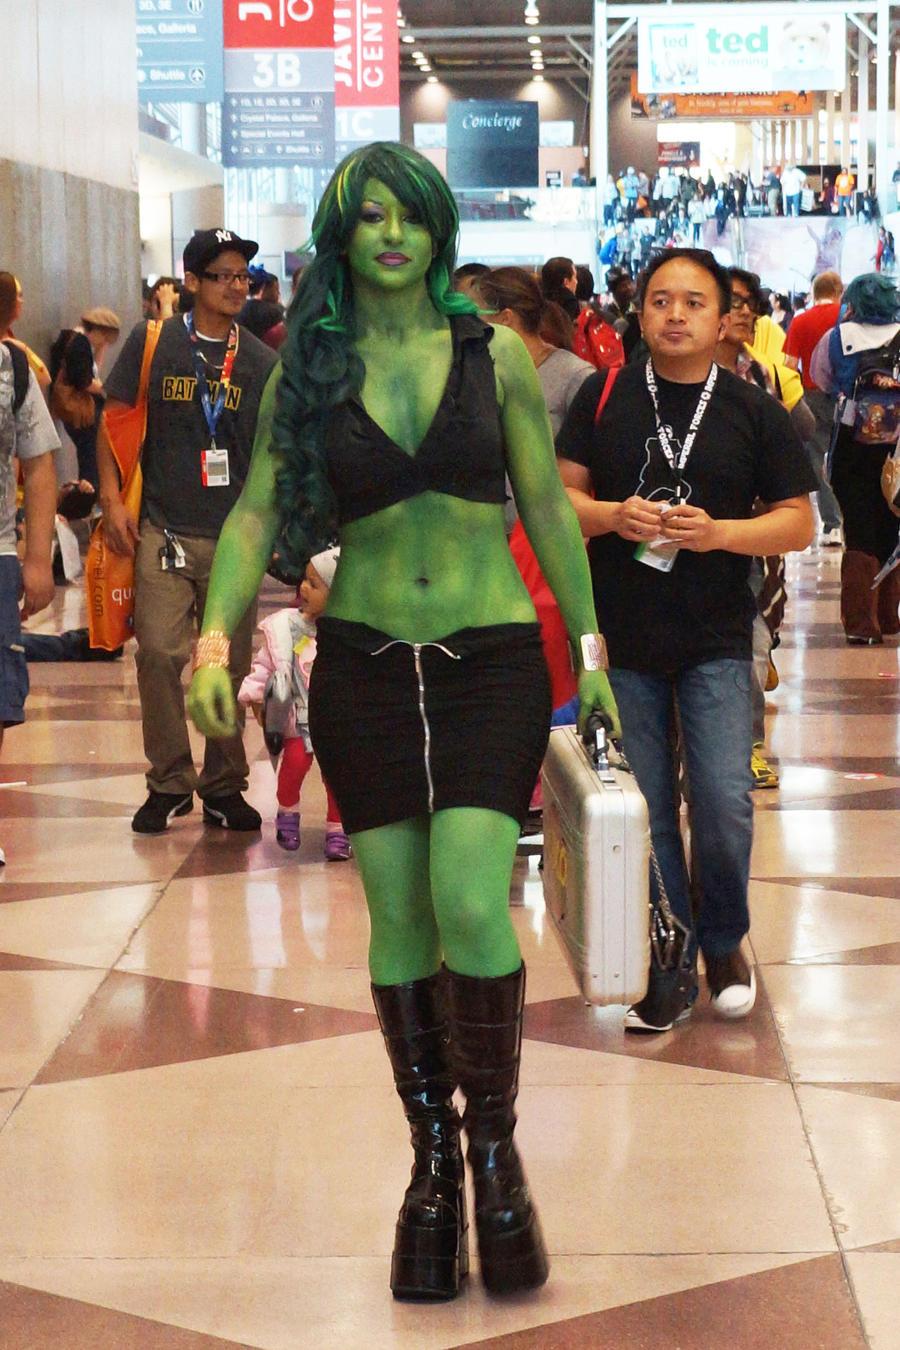 nycc_2012____she_hulk_1_by_kamau123-d5jz